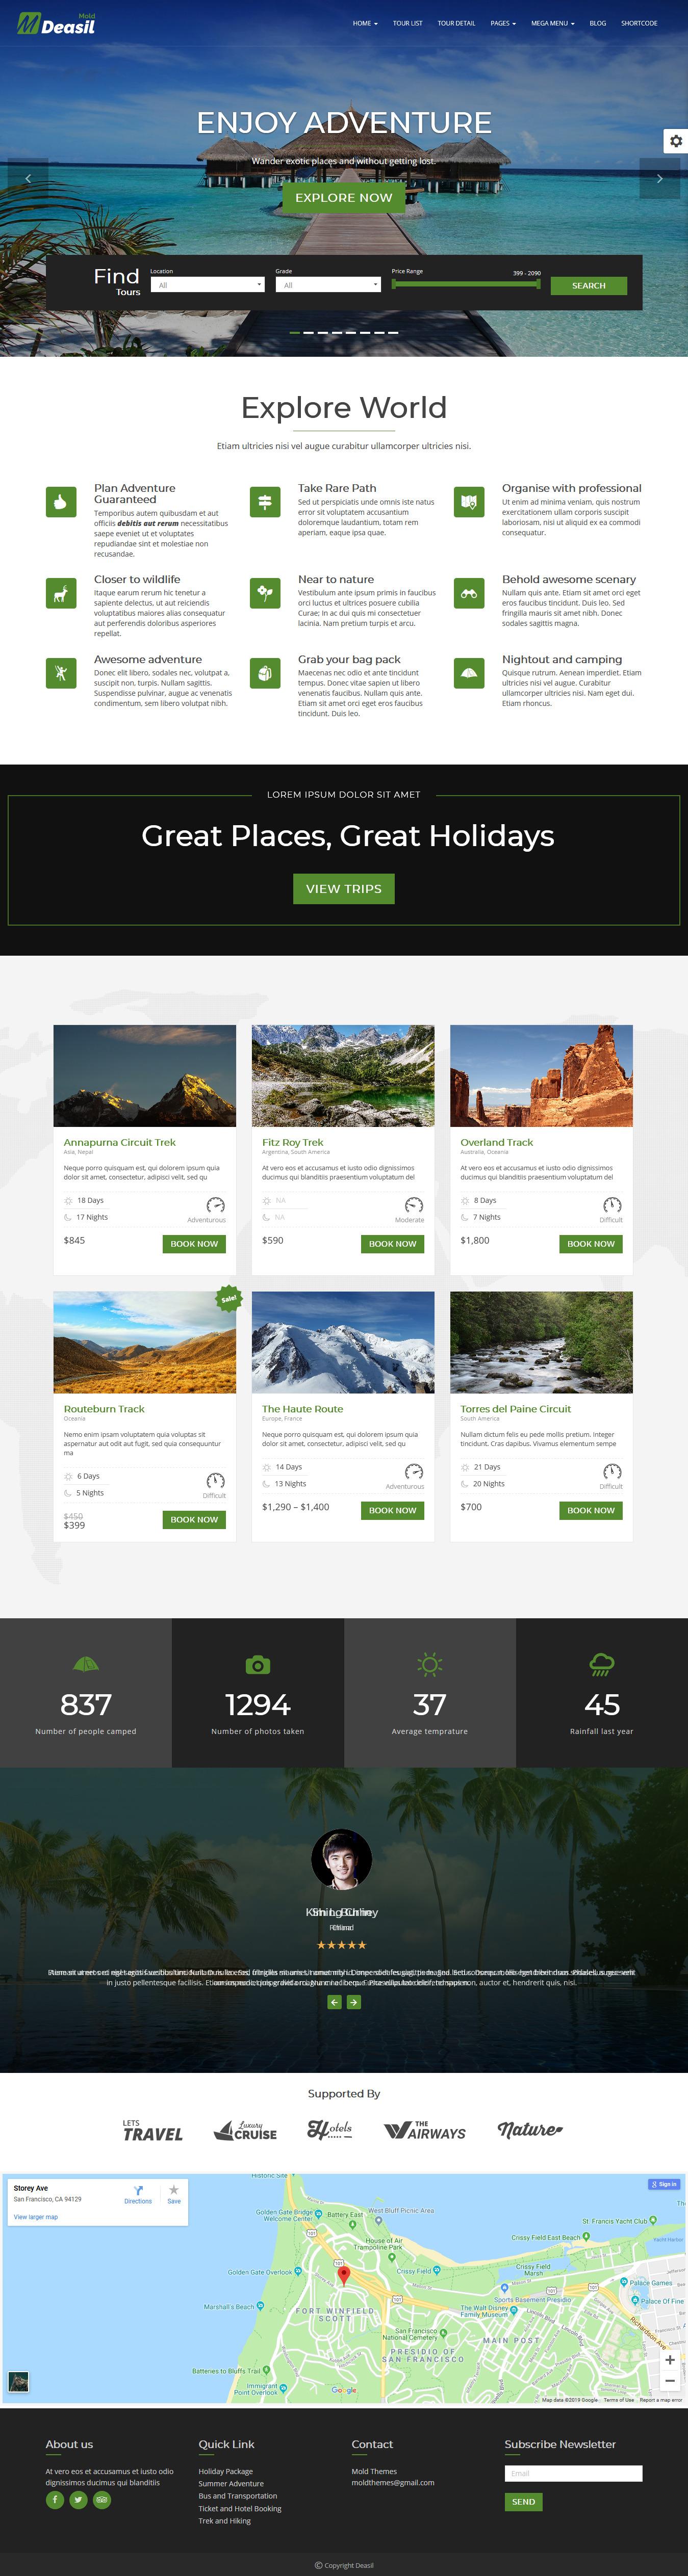 deasil best premium multilingual wordpress theme - 10+ Best Premium Multilingual WordPress Themes